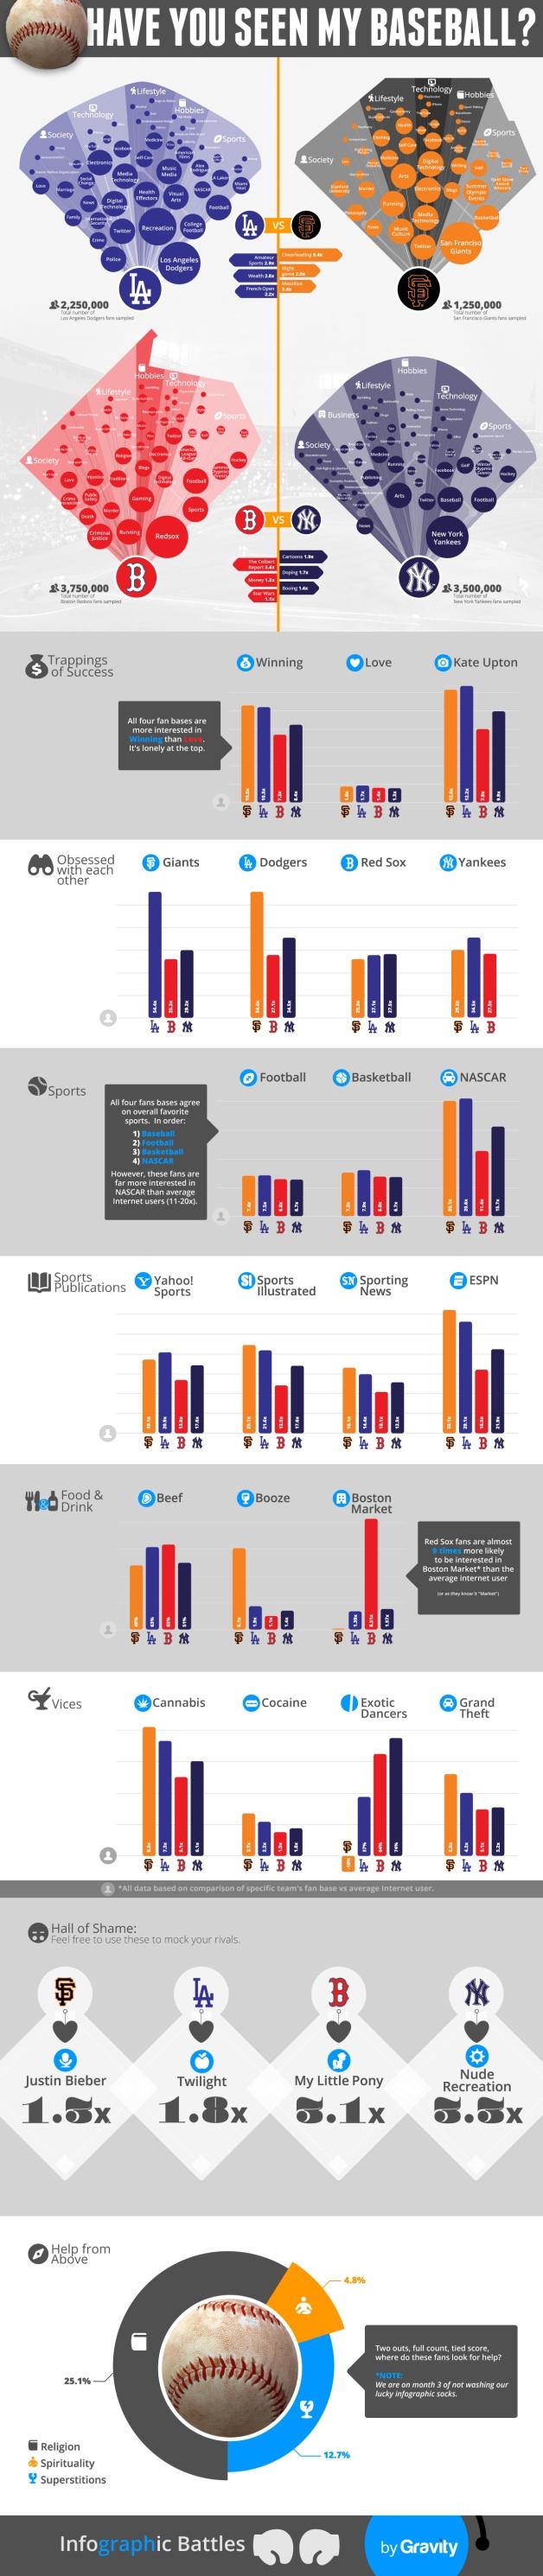 baseball_infographic